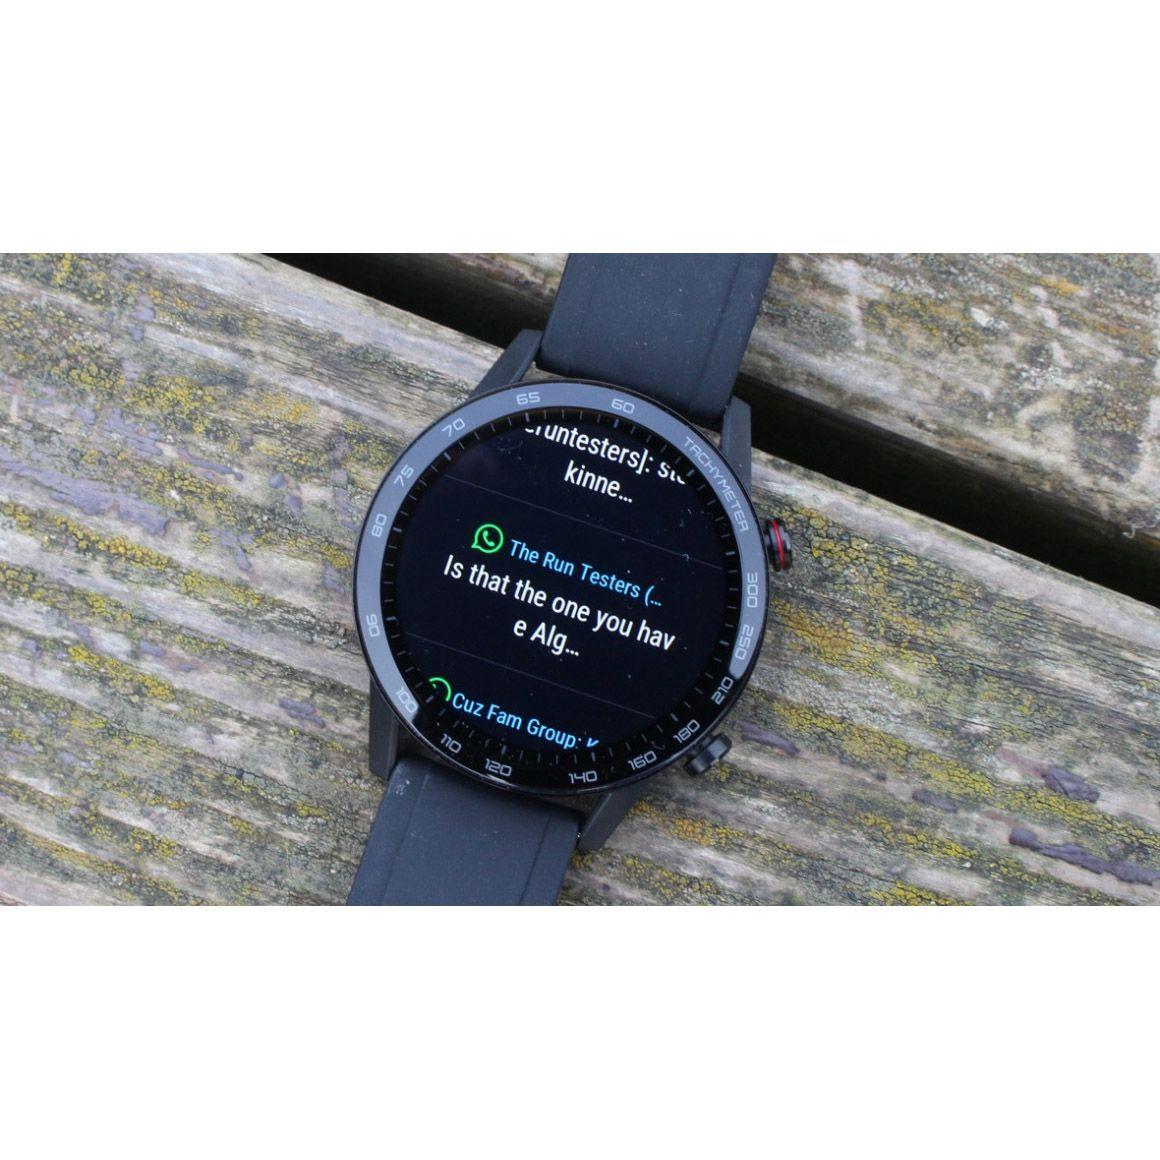 ساعت هوشمند آنر مدل MagicWatch 2 46 mm -  - 21